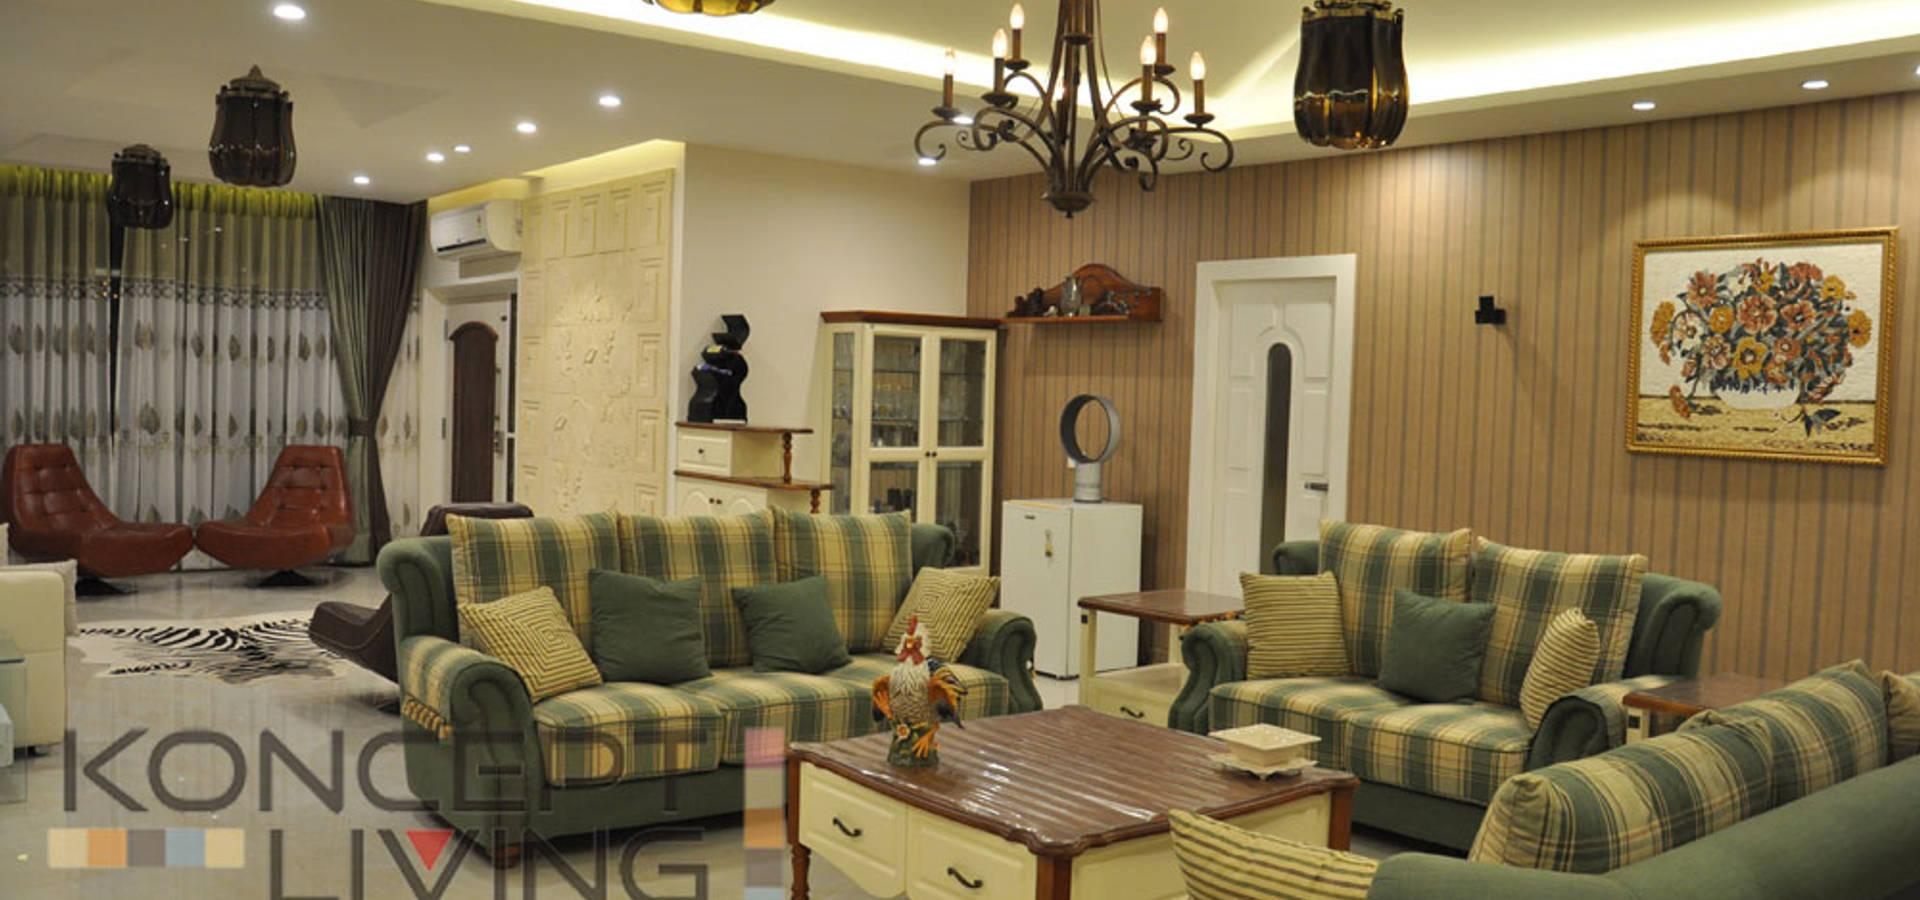 Koncept Living Interior Designers Decorators In